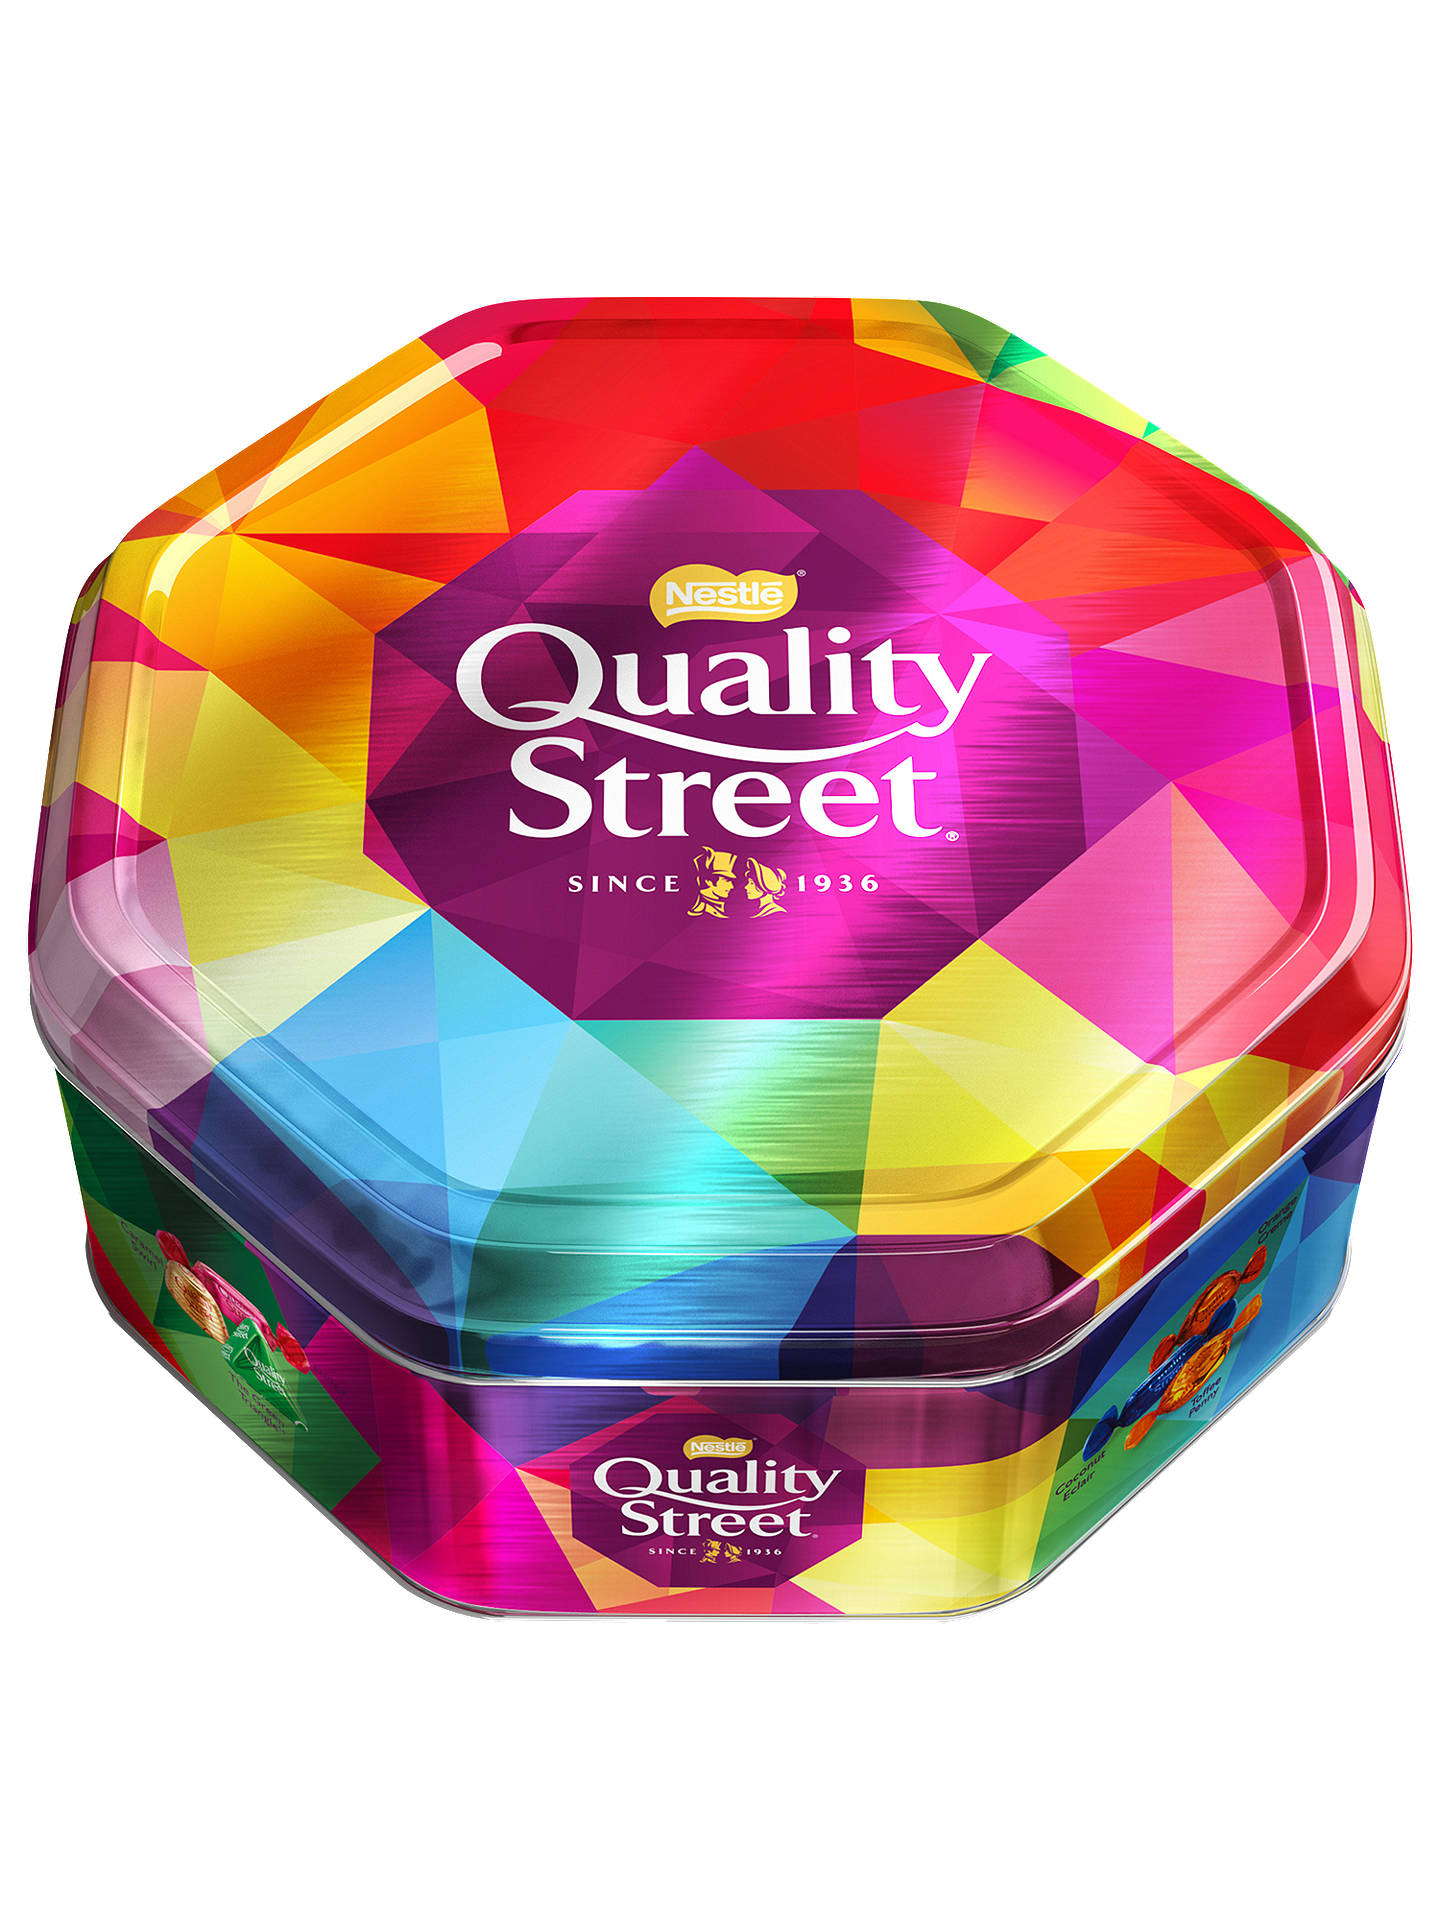 quality street  Nestlé Quality Street Tin, 1.2kg at John Lewis & Partners